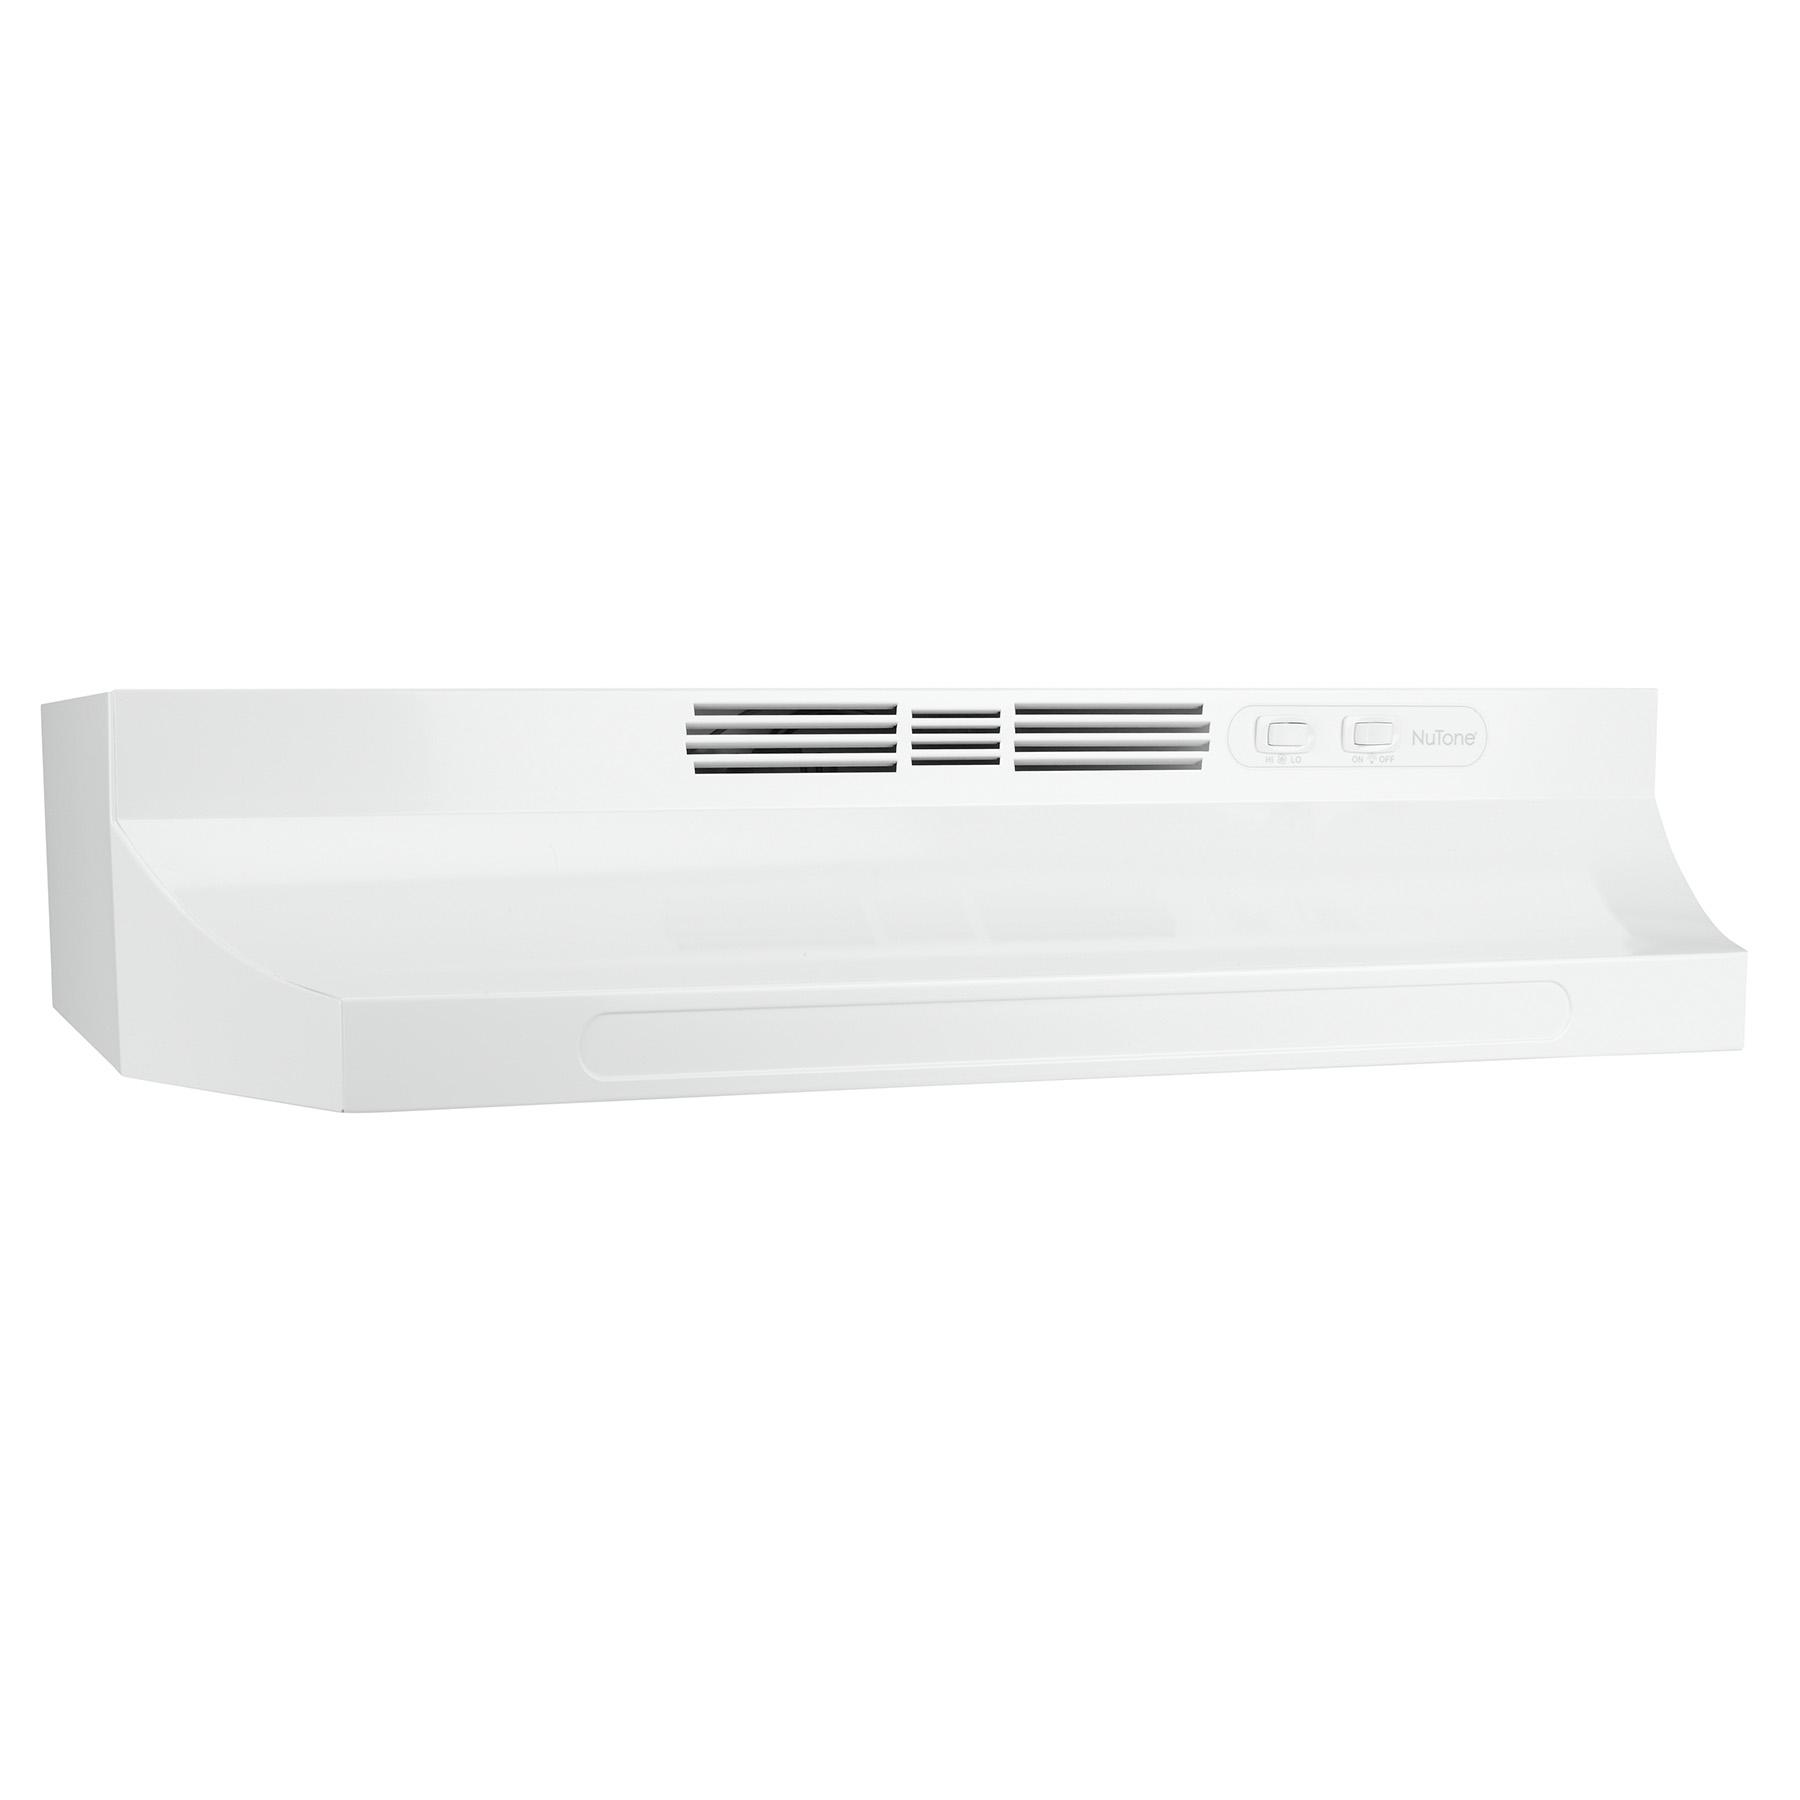 Rl6230wh Nutone 30 Ductless Under Cabinet Range Hood W Light White